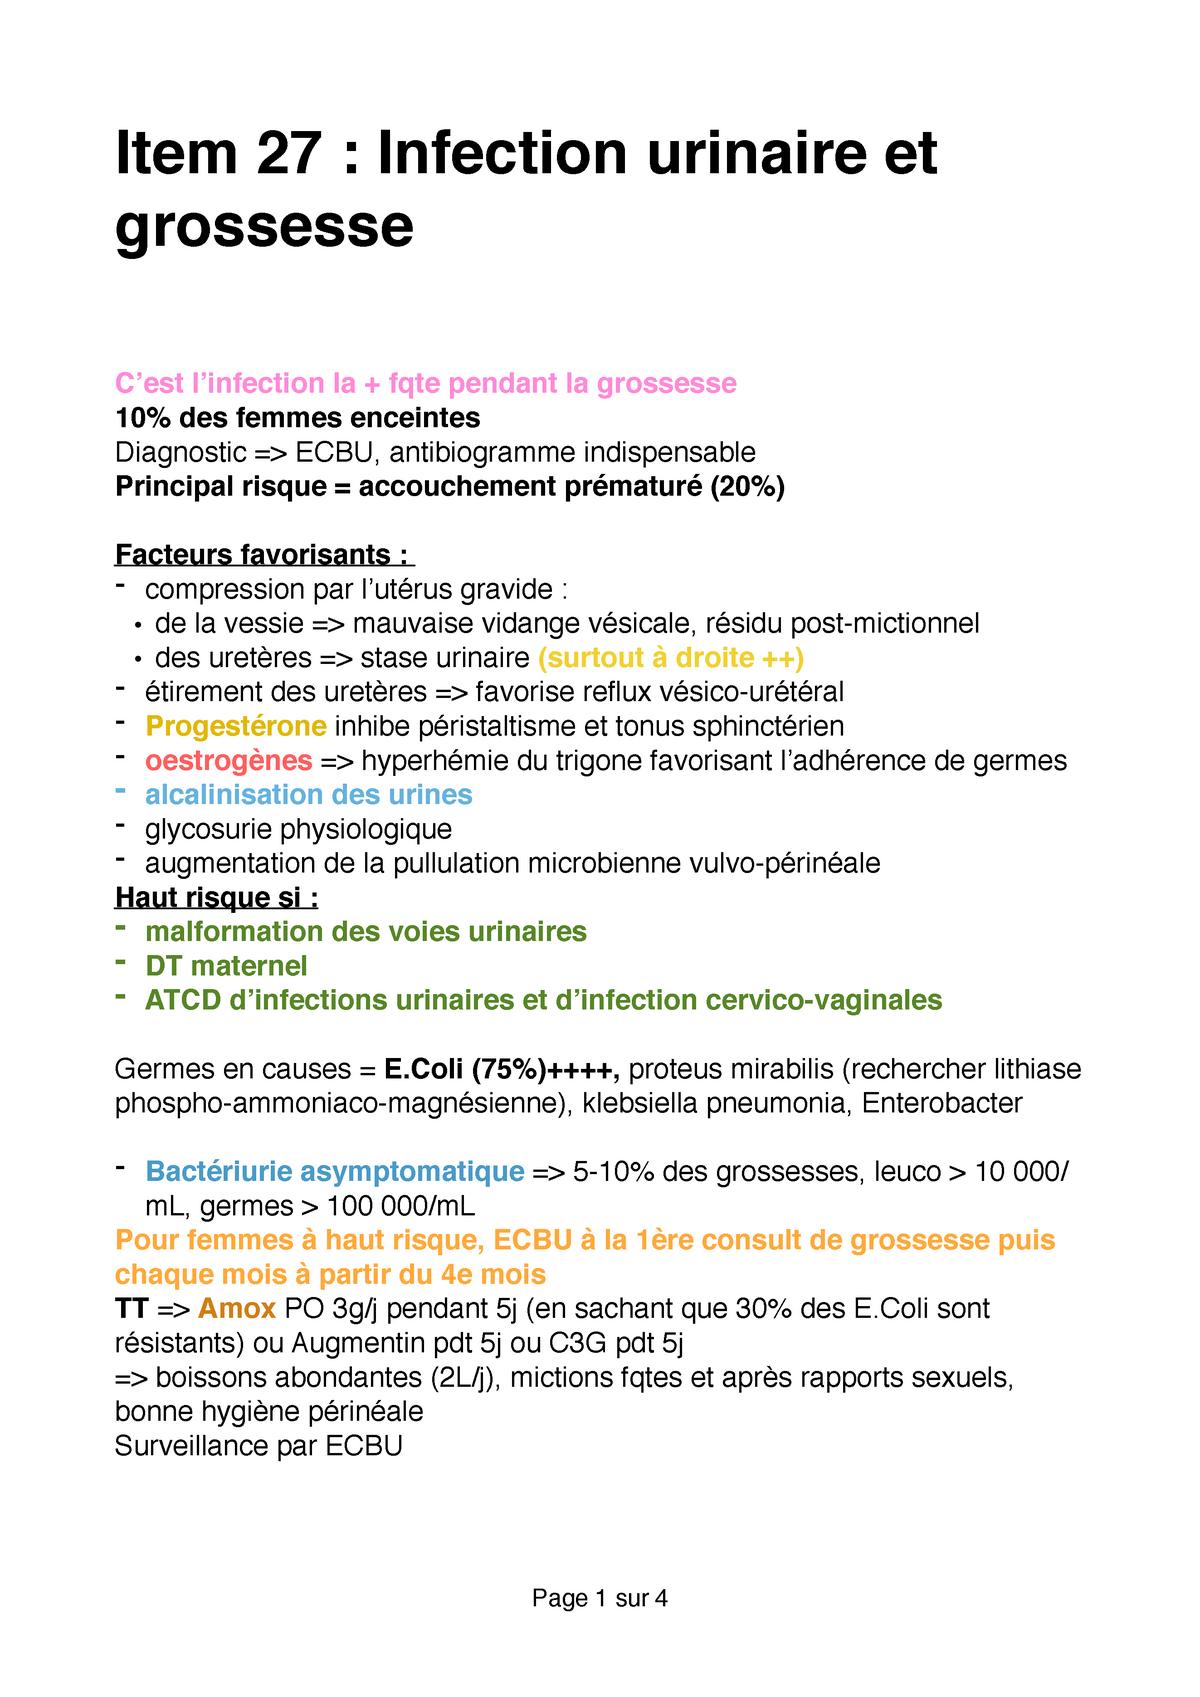 Item 27 - Infection urinaire et grossesse - Item iECN: Item IECN ...